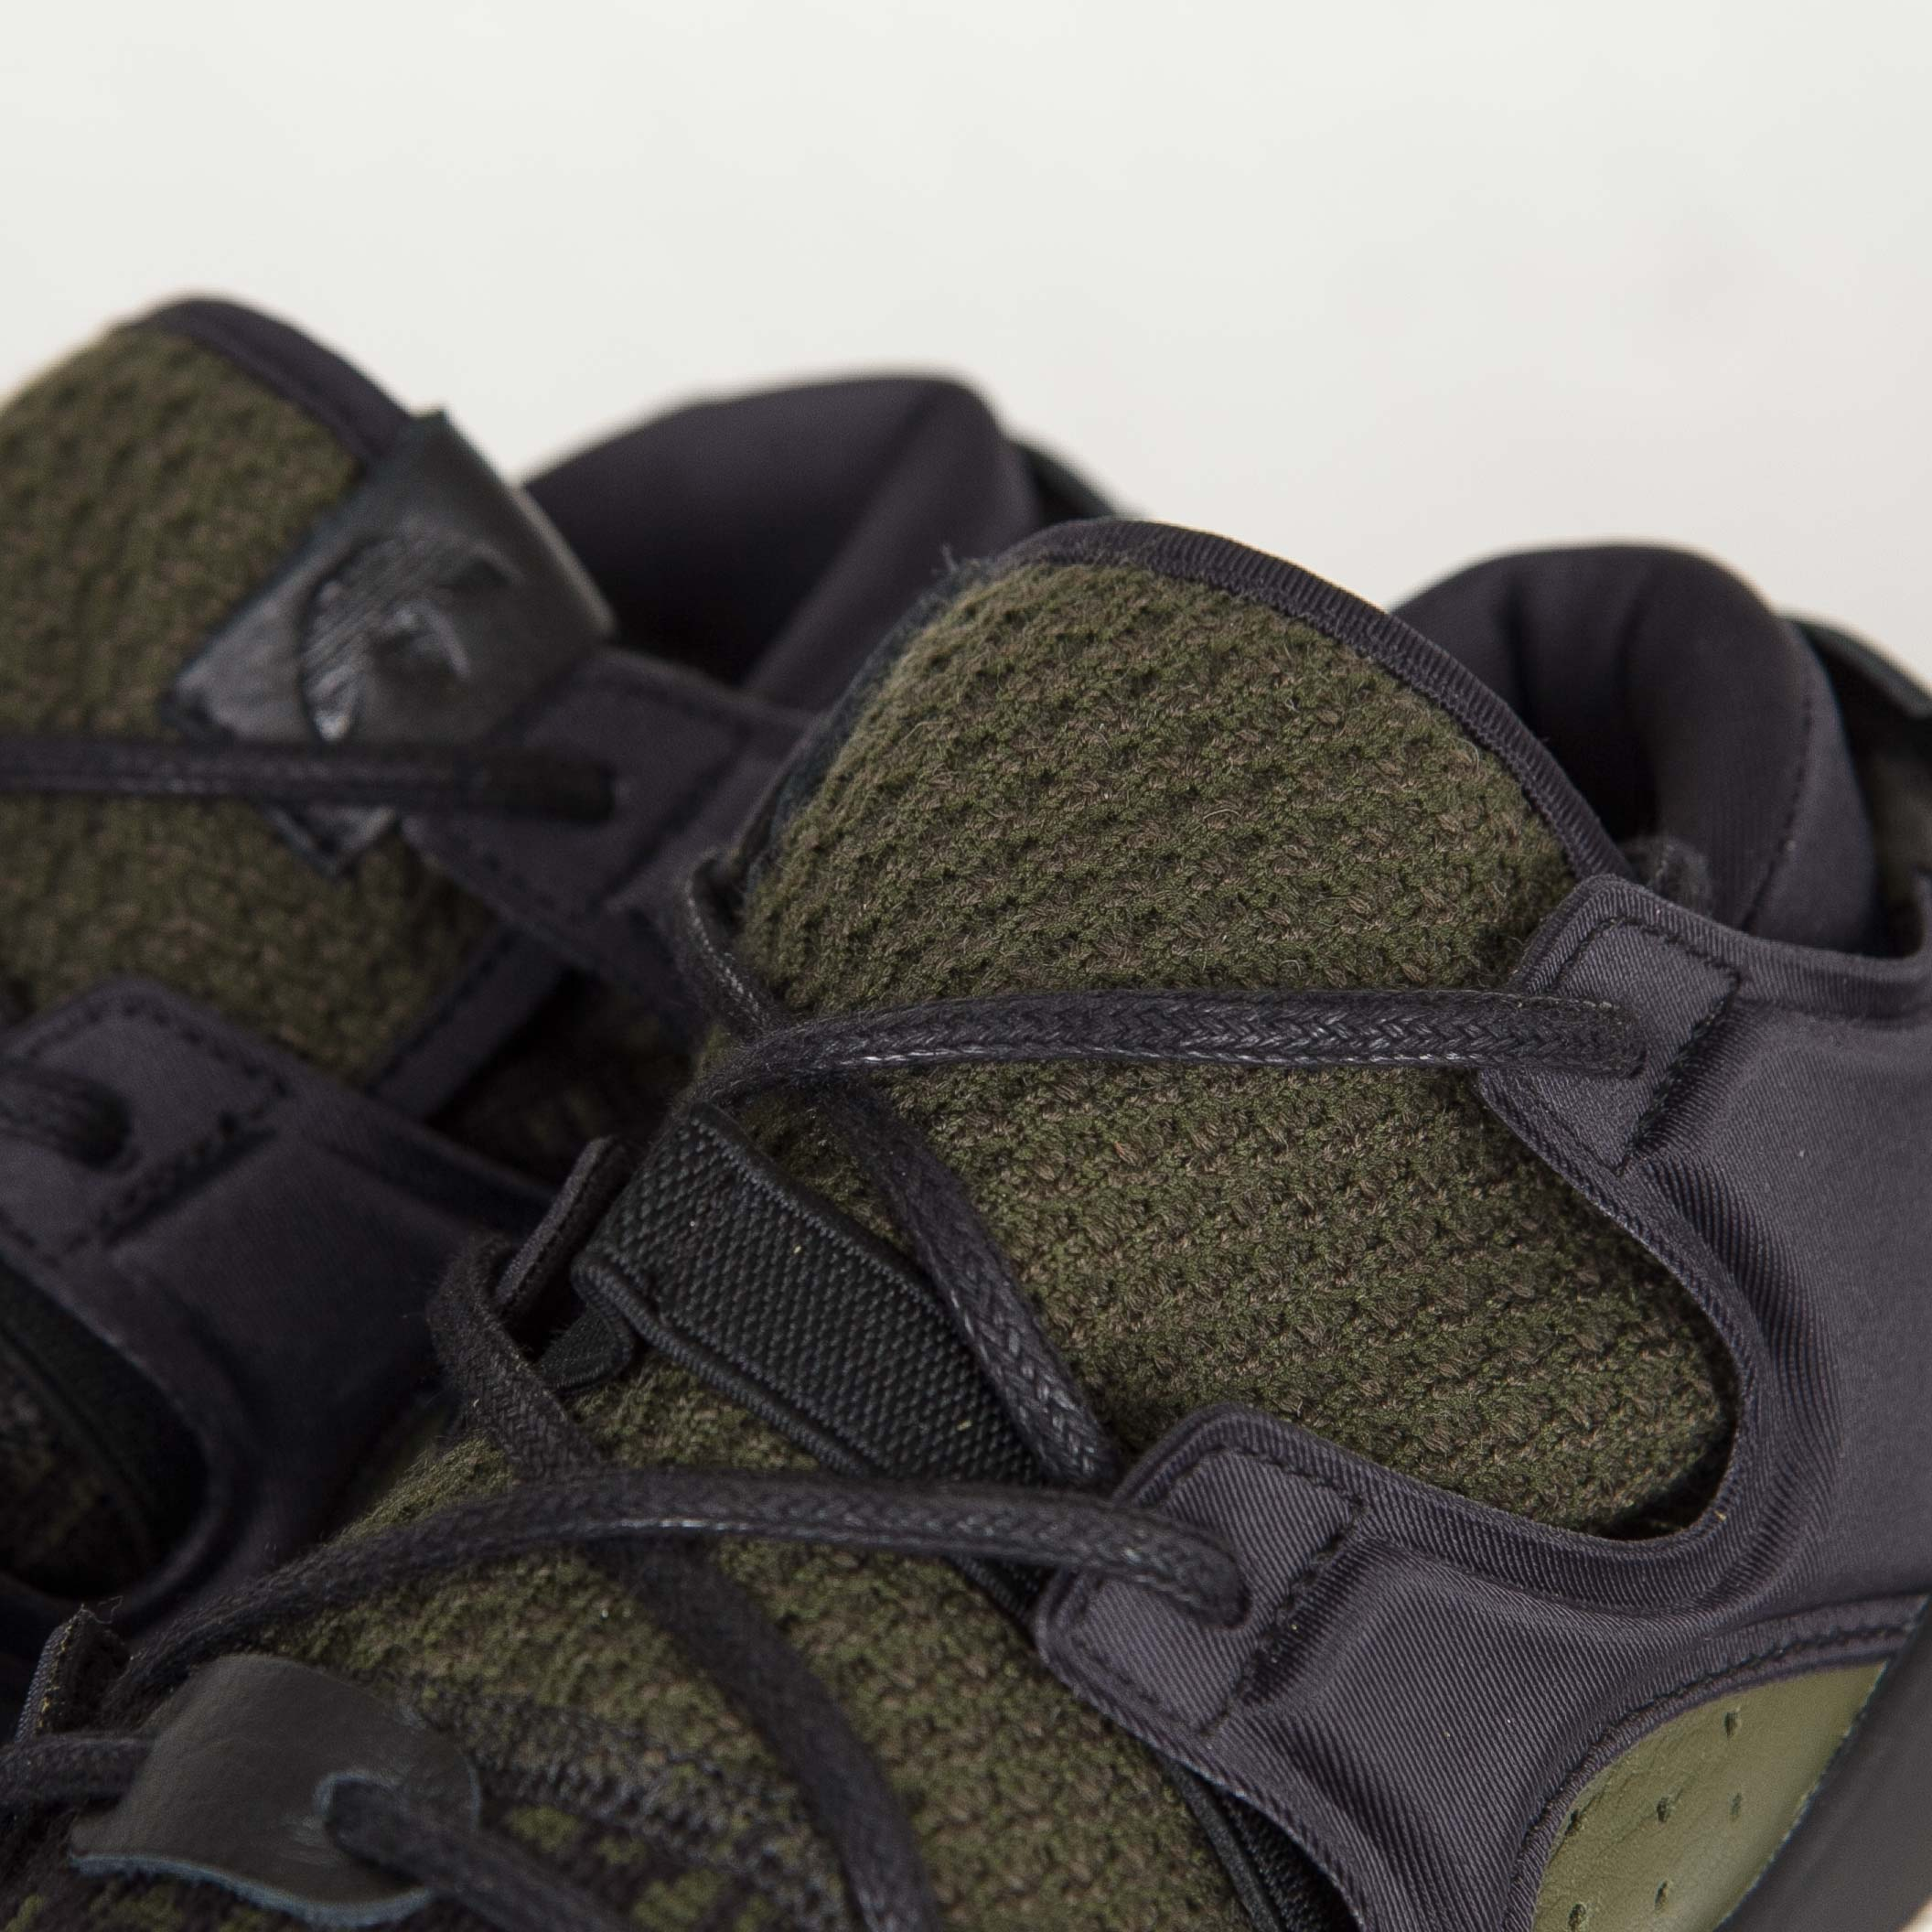 bd899f6cf adidas EQT 2 3F15 AthL - Aq5263 - Sneakersnstuff